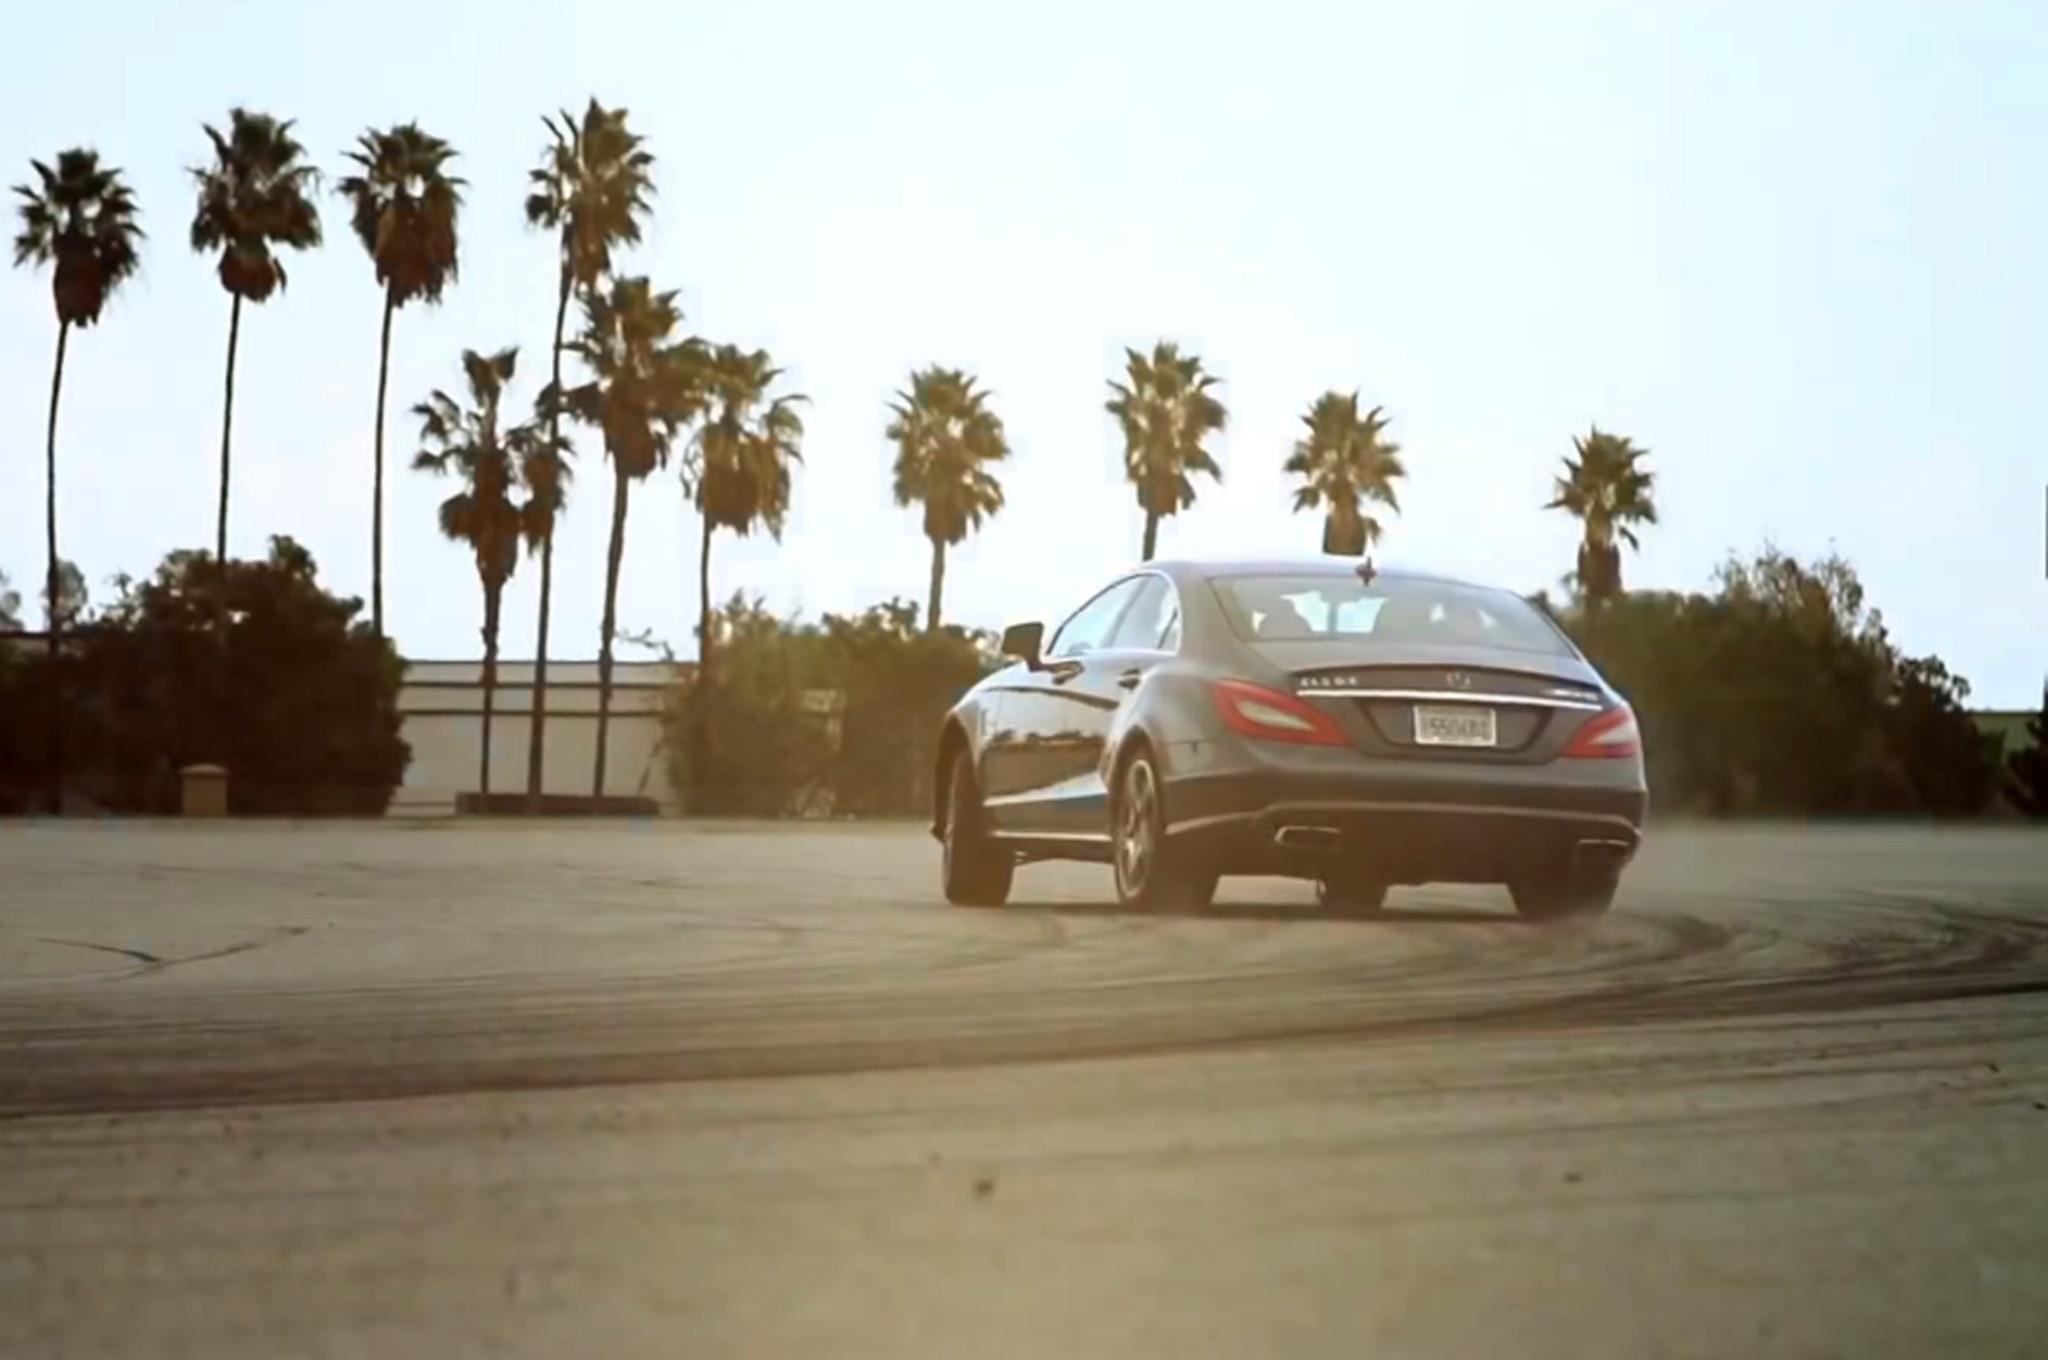 2014 Mercedes Benz Cls63 S Amg Video